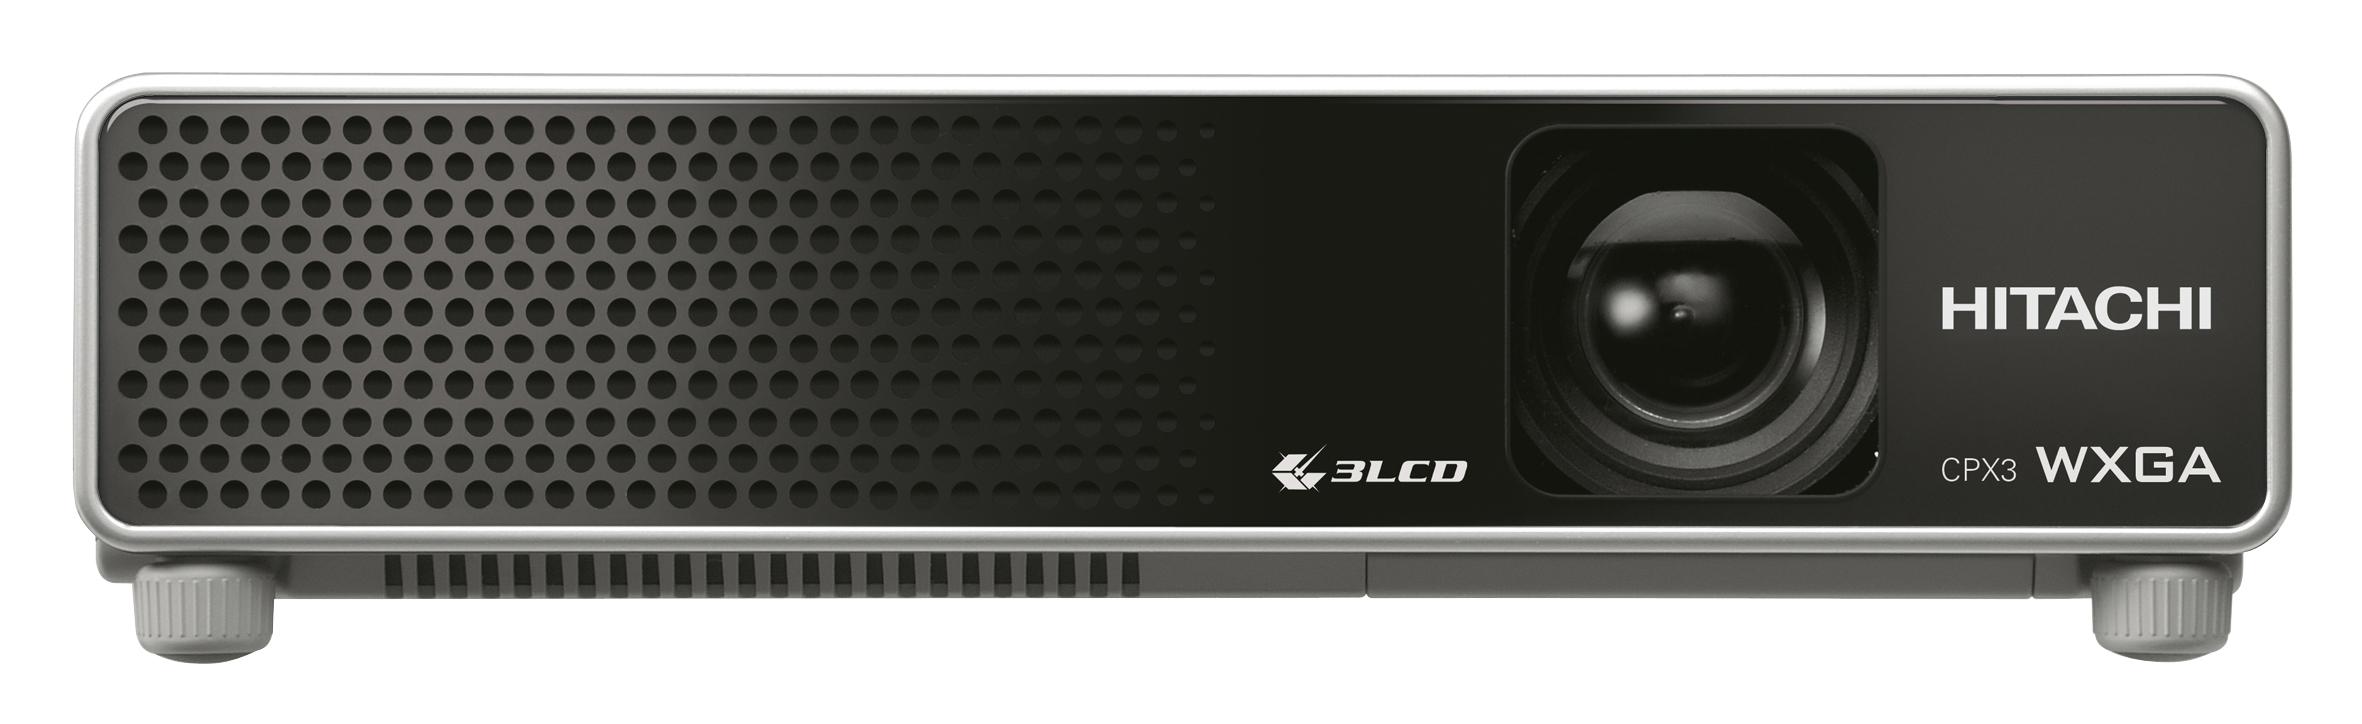 Hitachi Projektoren Cp X3 W Wxga Lcd Beamer X4041wn Wifi Projector Projektor